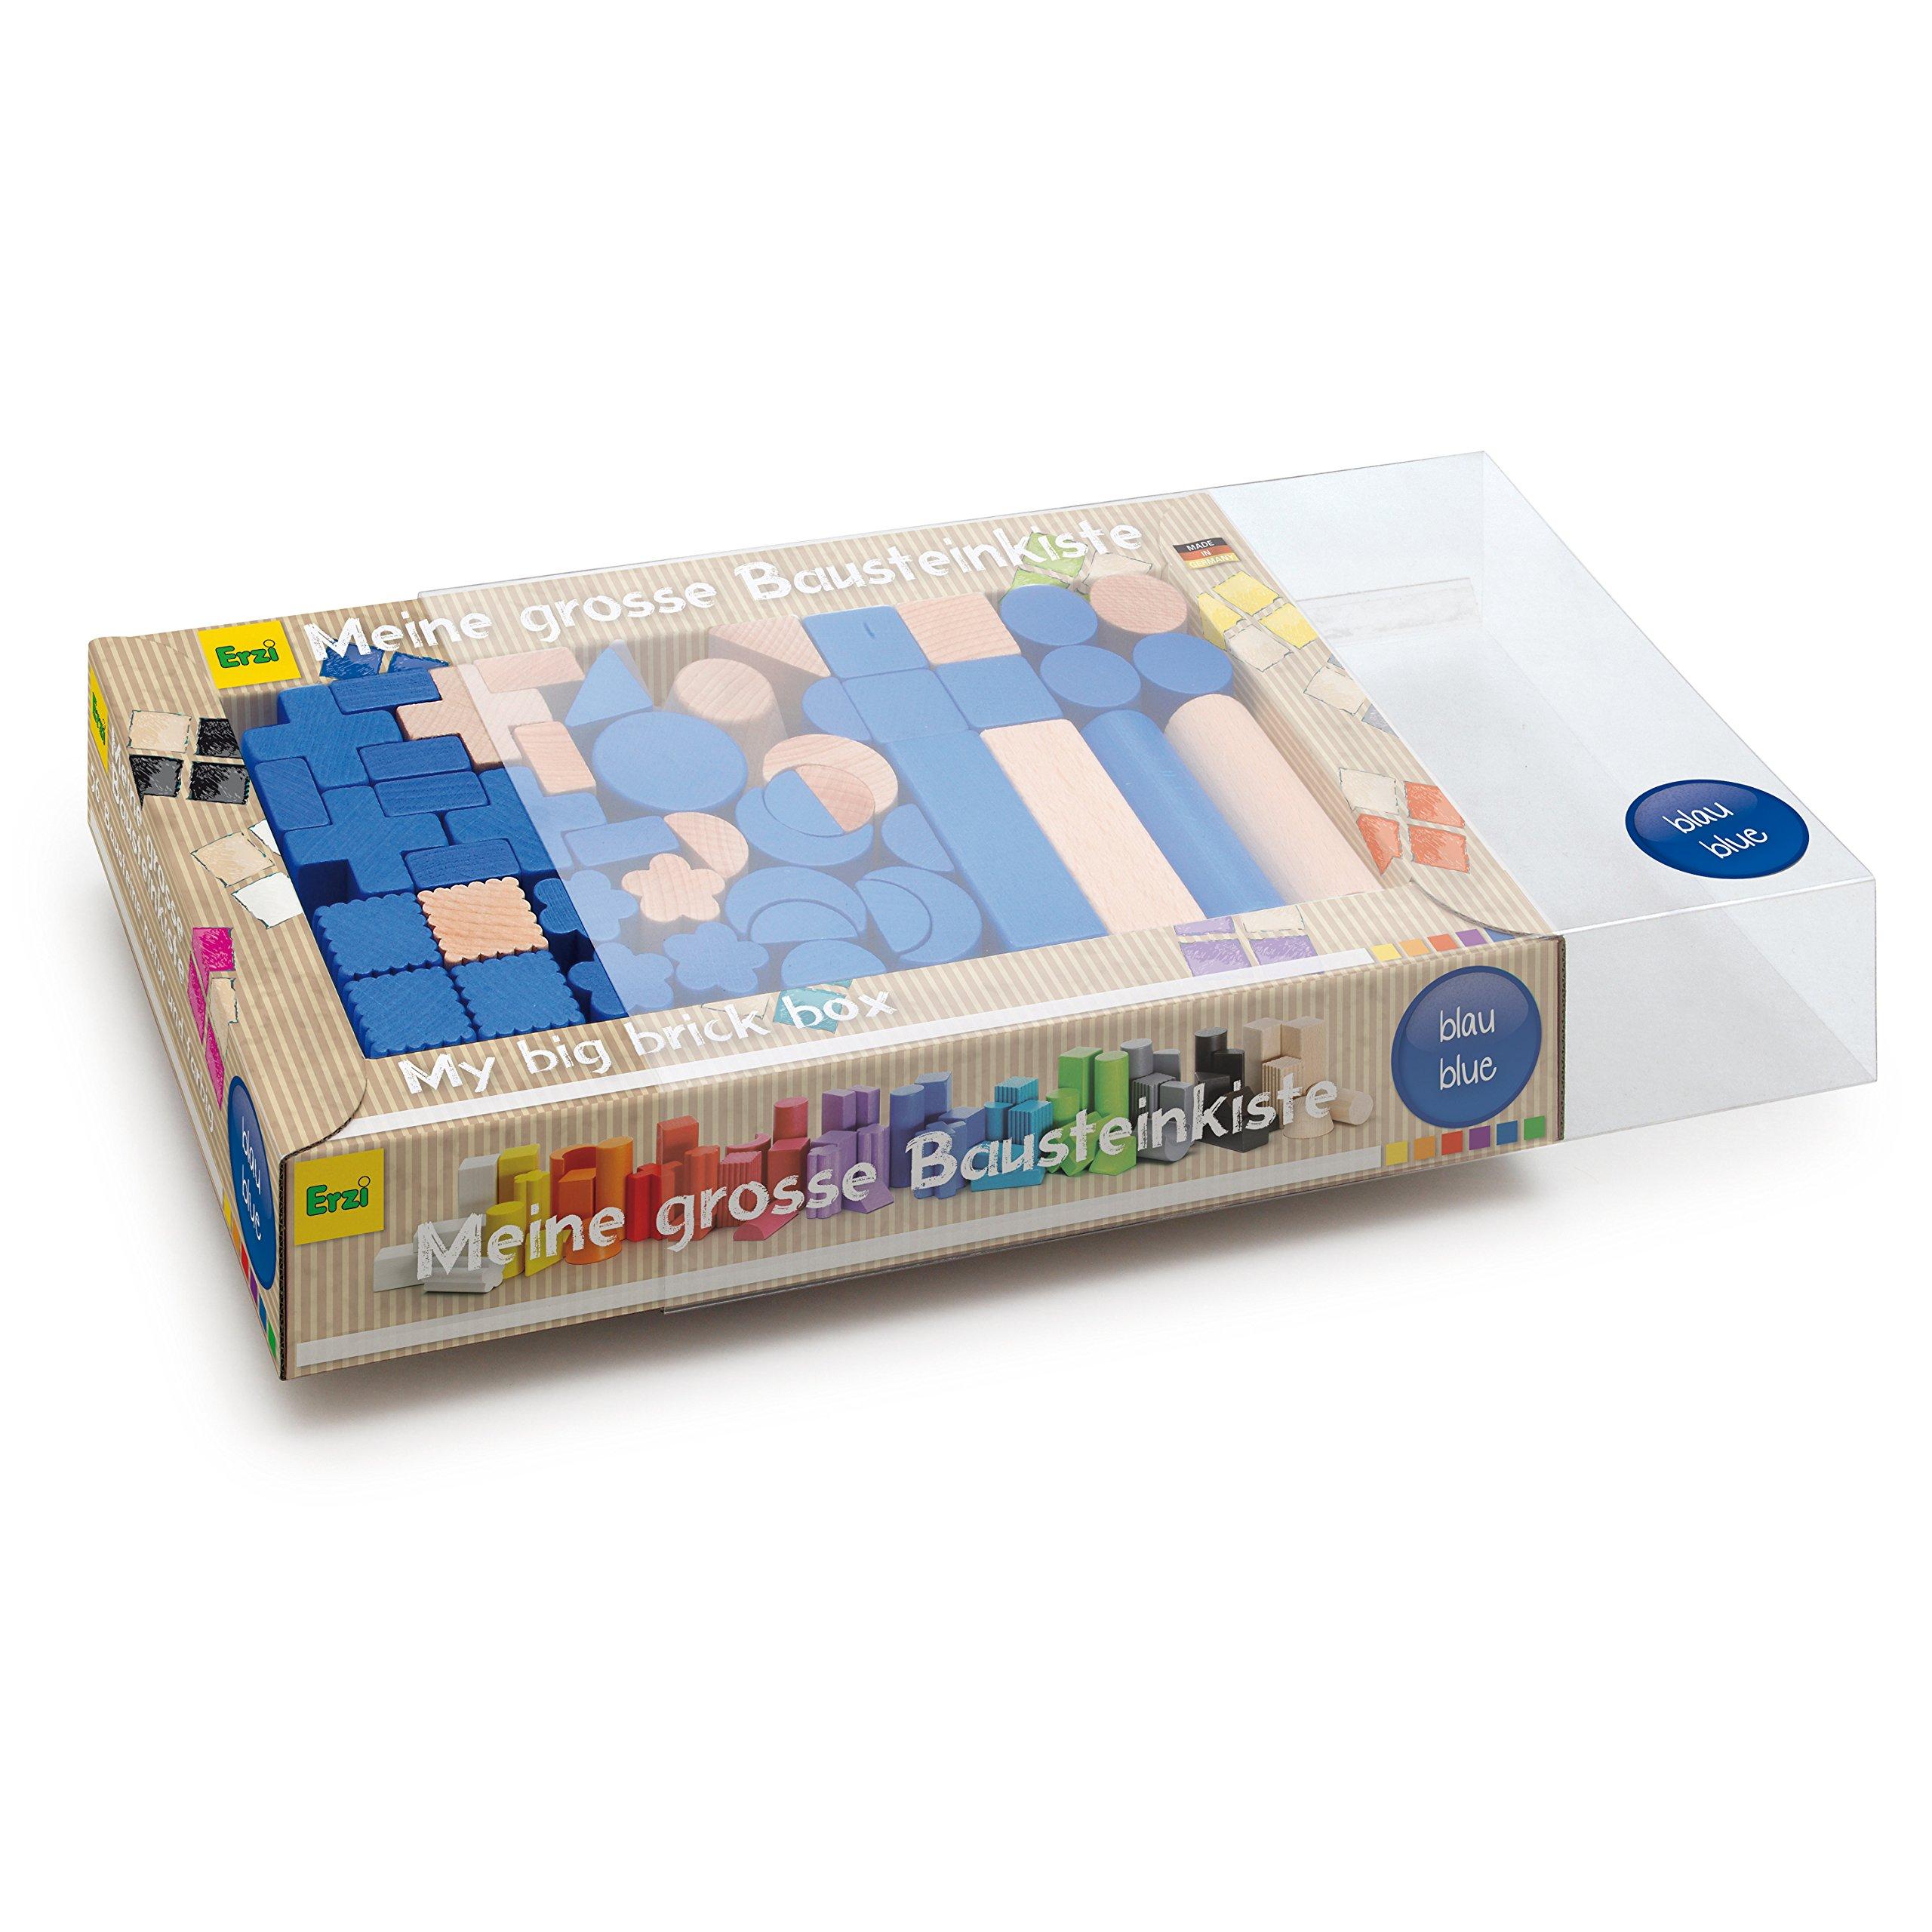 Erzi German Wooden Toy Building Blocks, 36 x 21 x 6.2cm, Blue